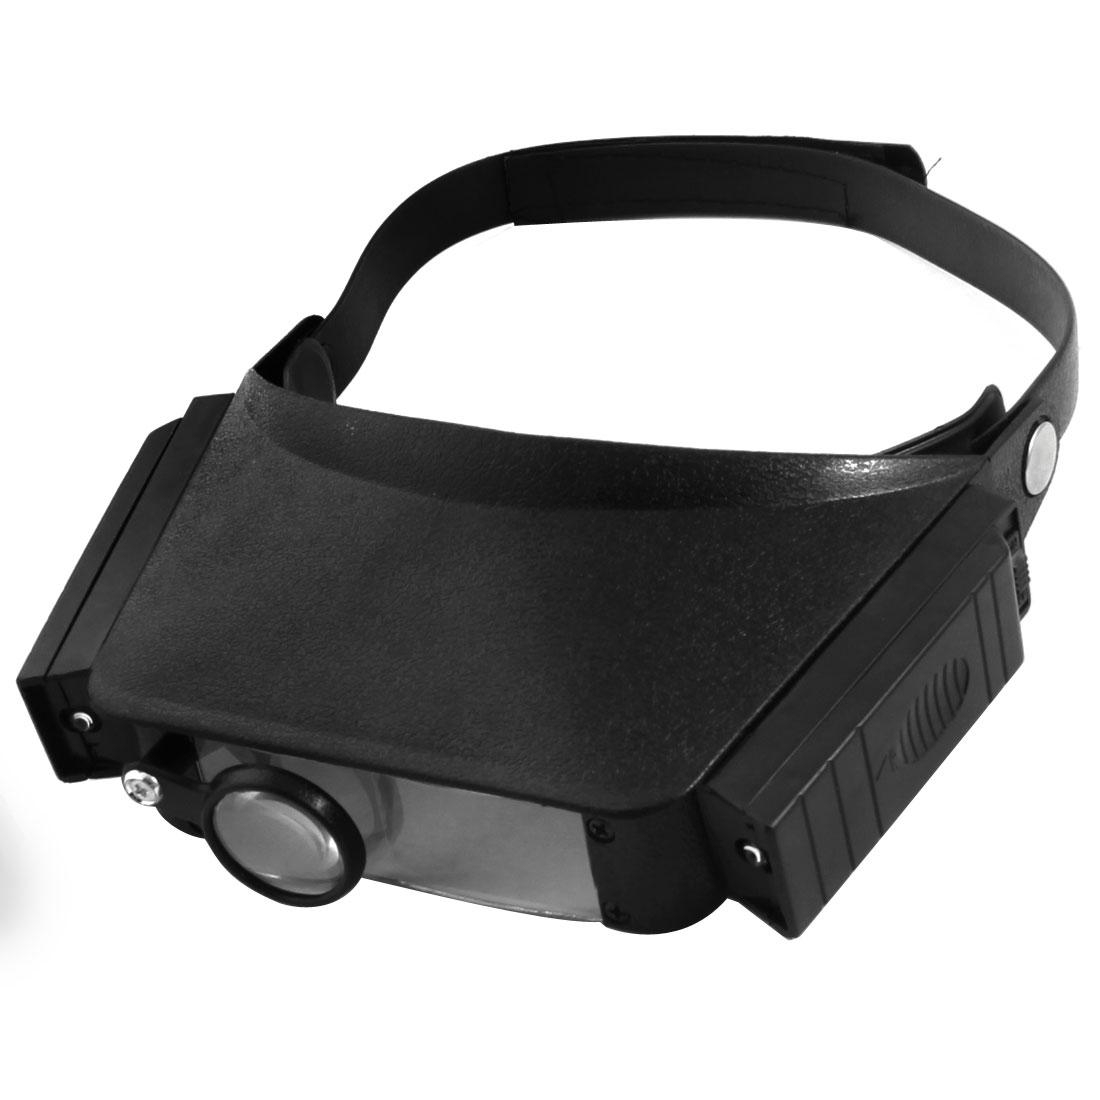 Headband LED Lamp Light Jeweler Magnifier Magnifying Glass Loupe 1.8X 2.3X 3.7X